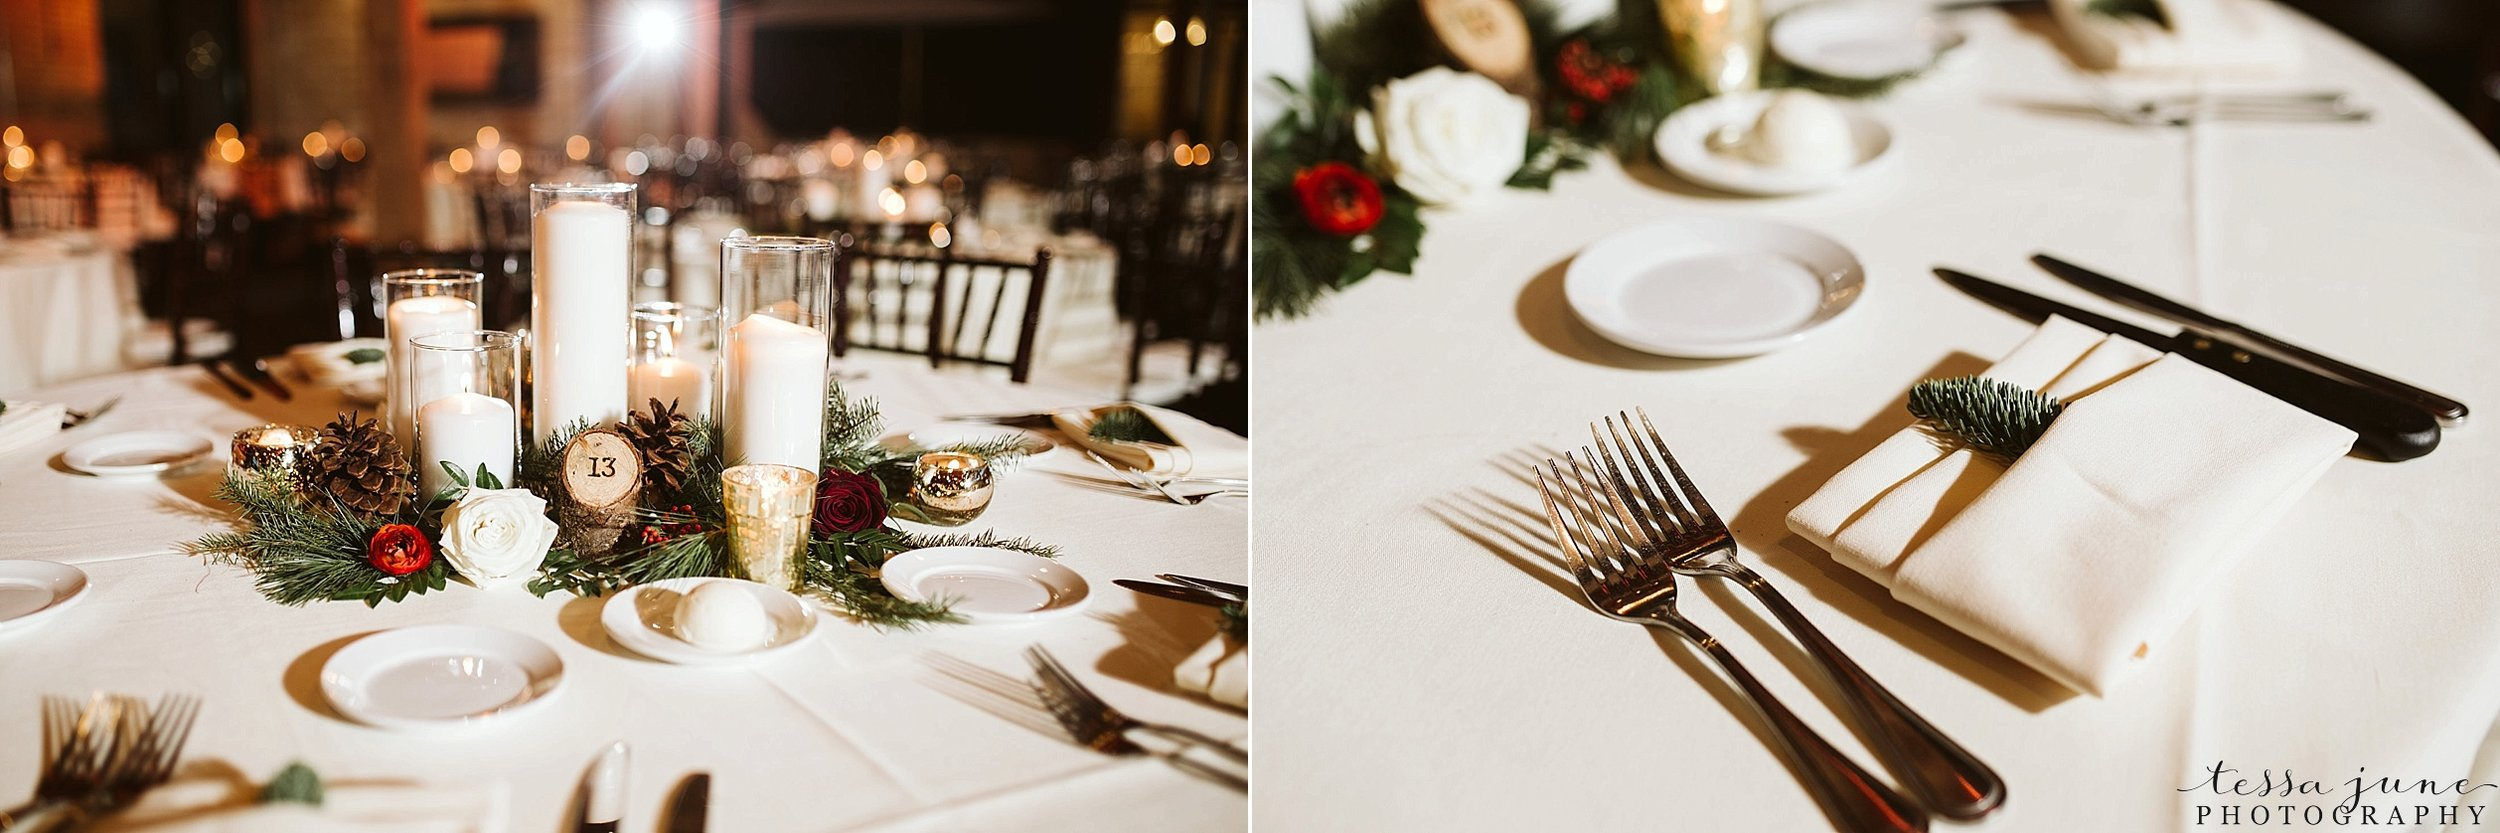 minneapolis-event-center-winter-romantic-snow-wedding-december-162.jpg